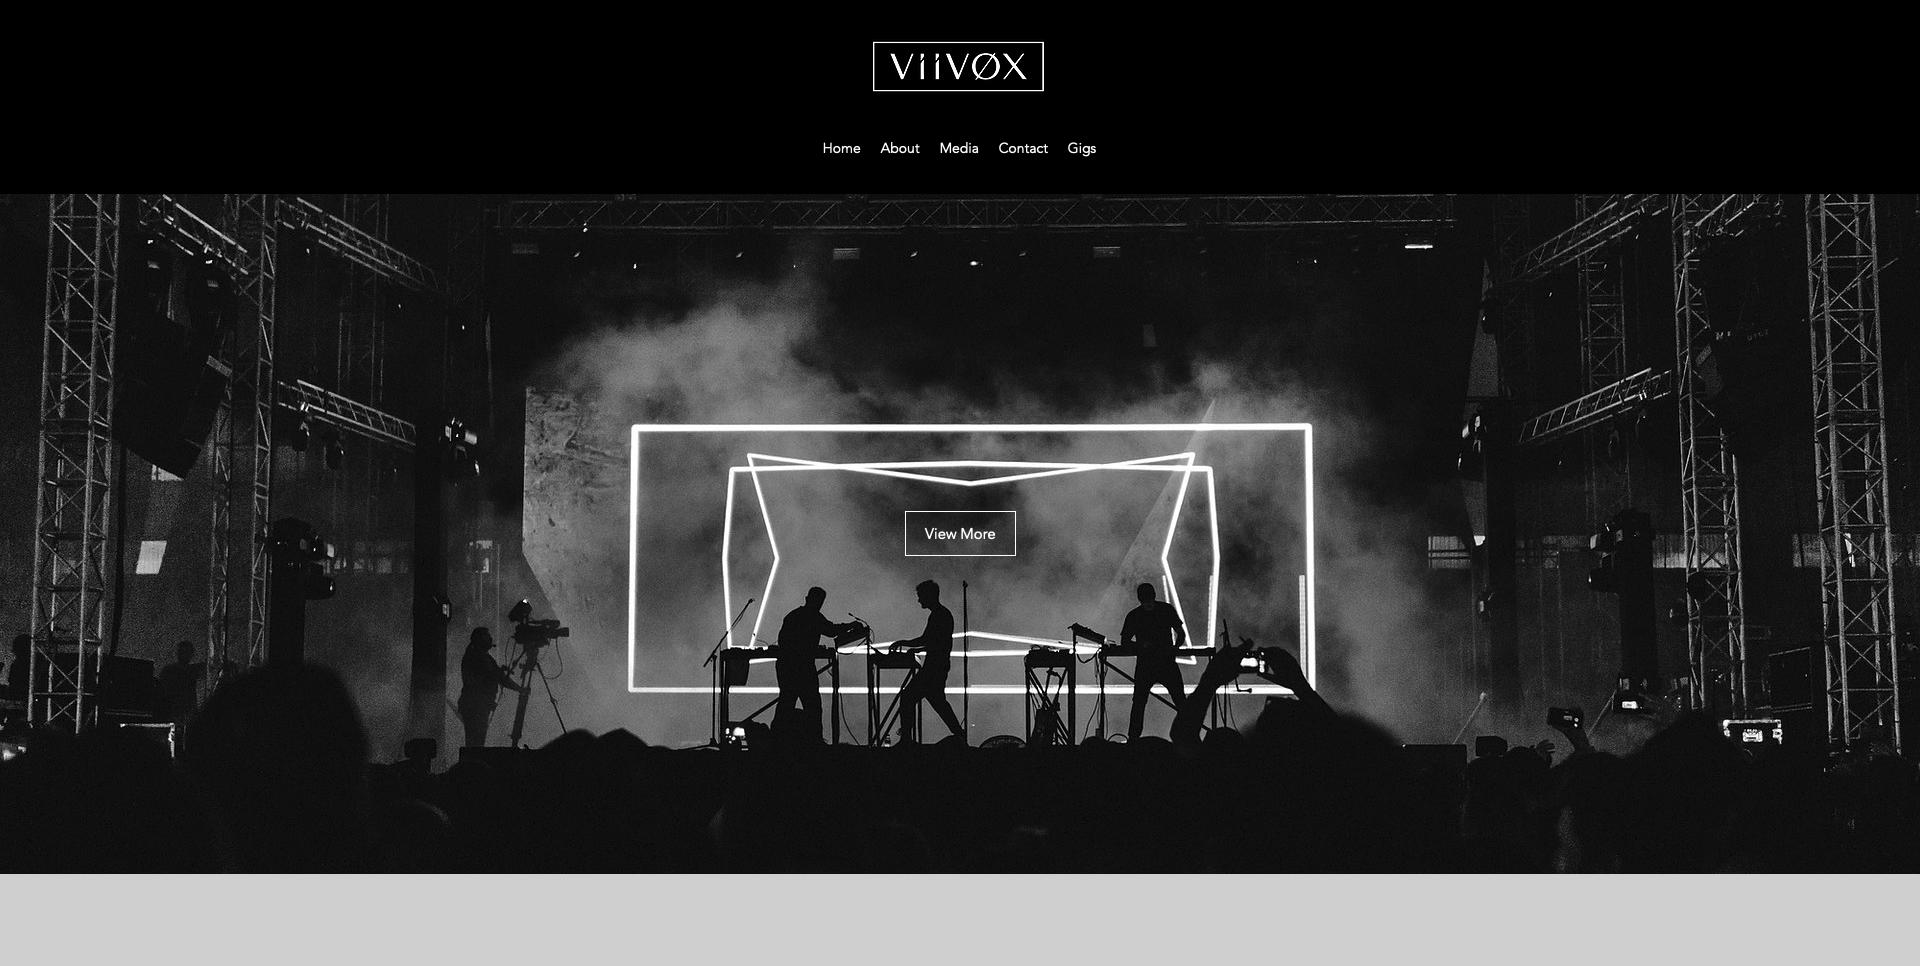 Viivox home